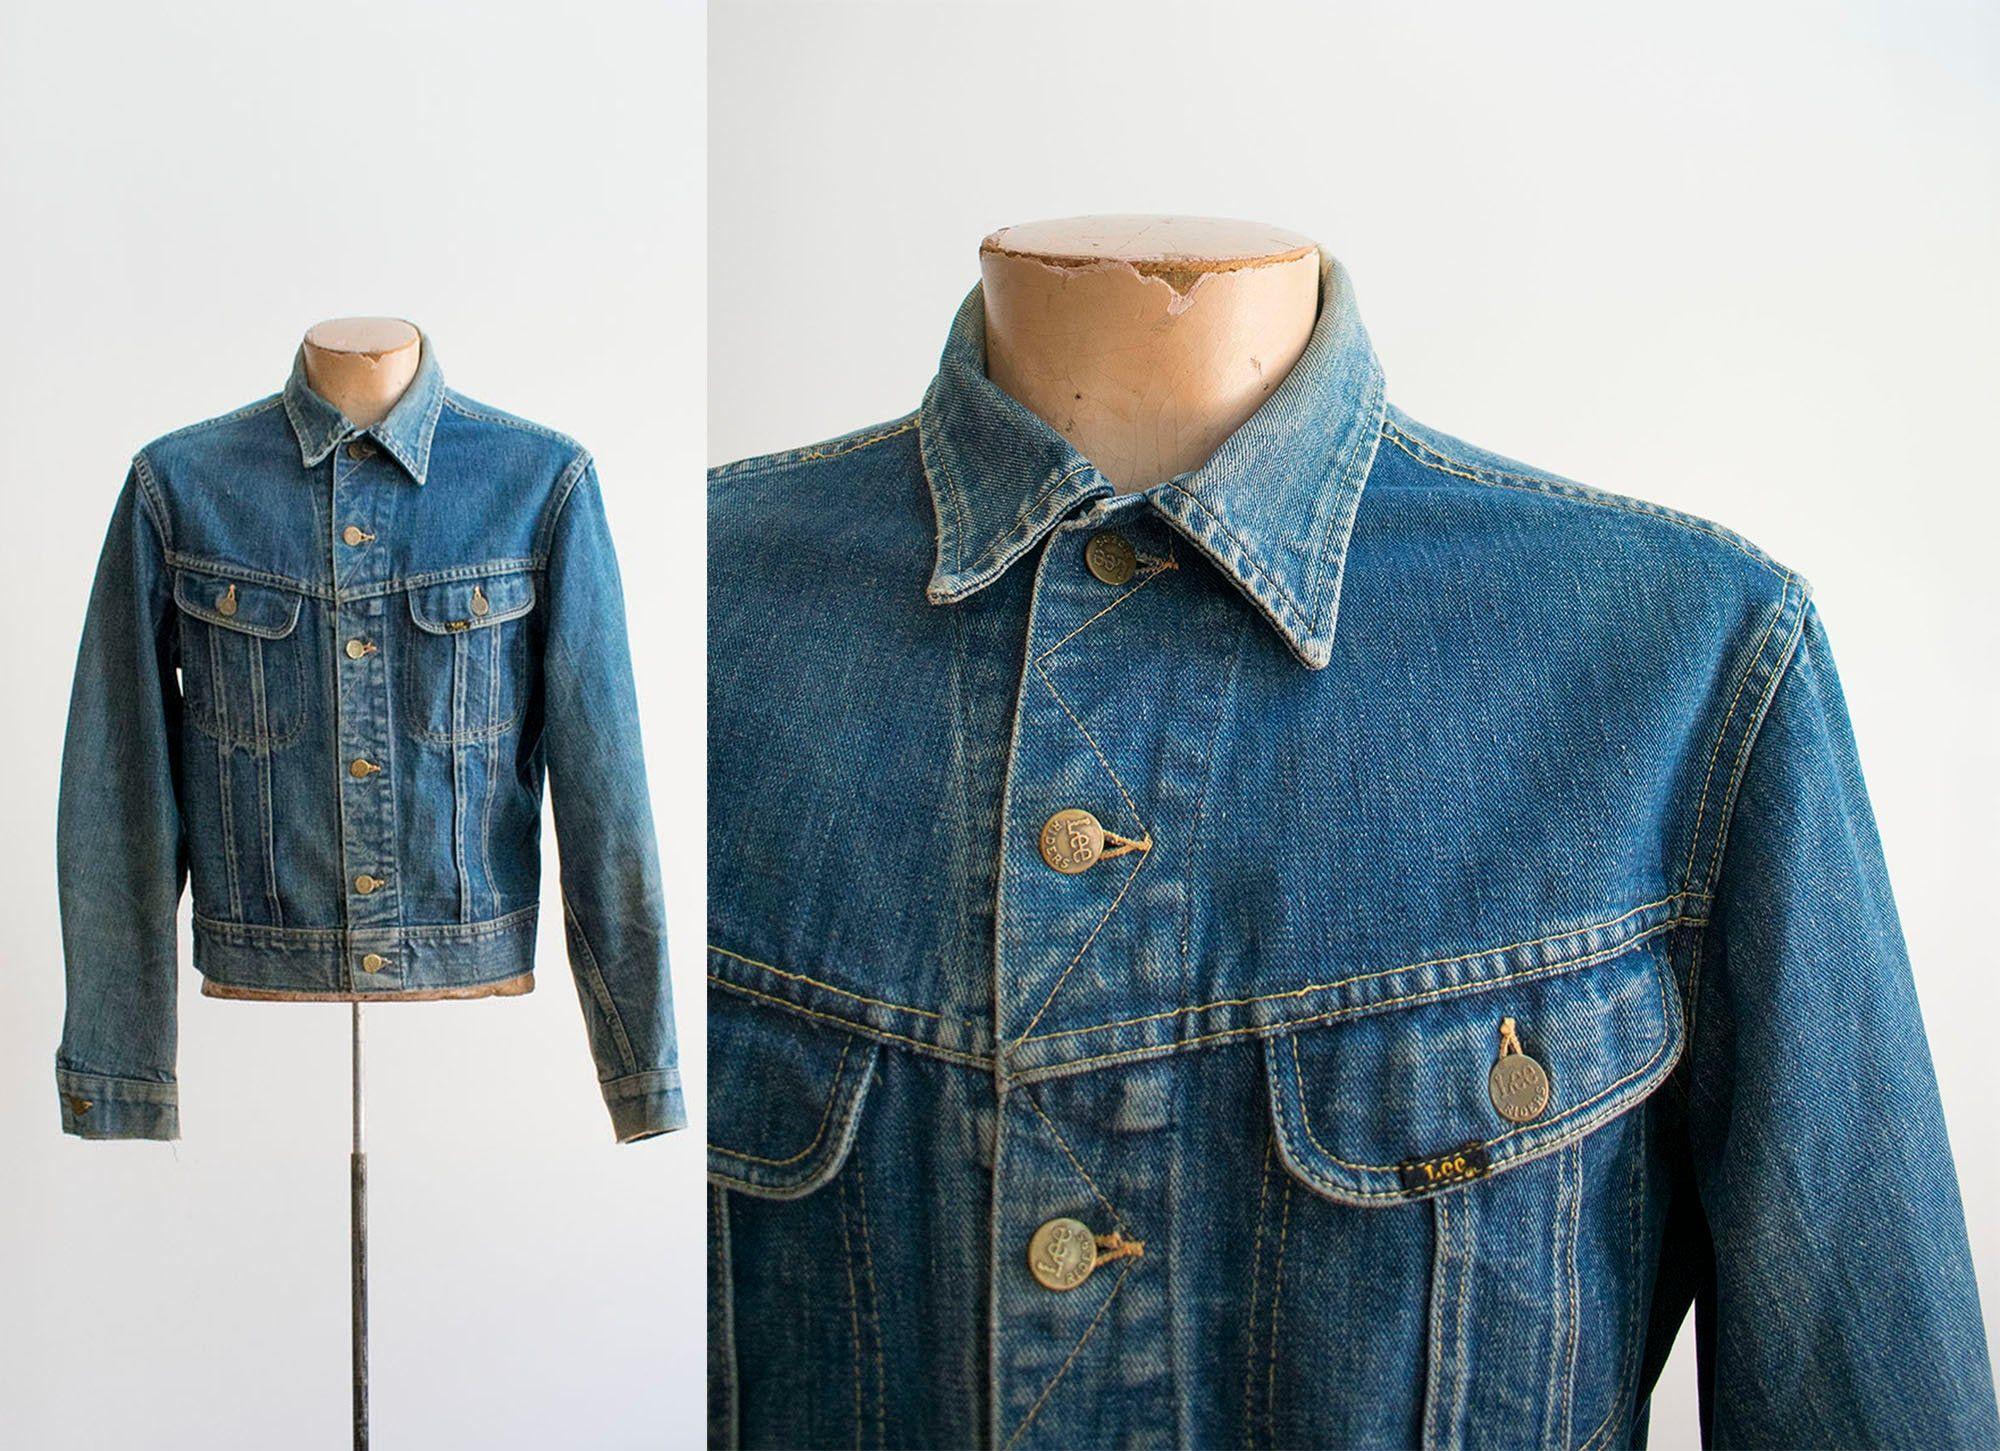 Vintage Denim Jacket Vintage Lee Denim Jacket Lee Jean Etsy Vintage Denim Jacket Denim Jacket Vintage Denim [ 1451 x 2000 Pixel ]